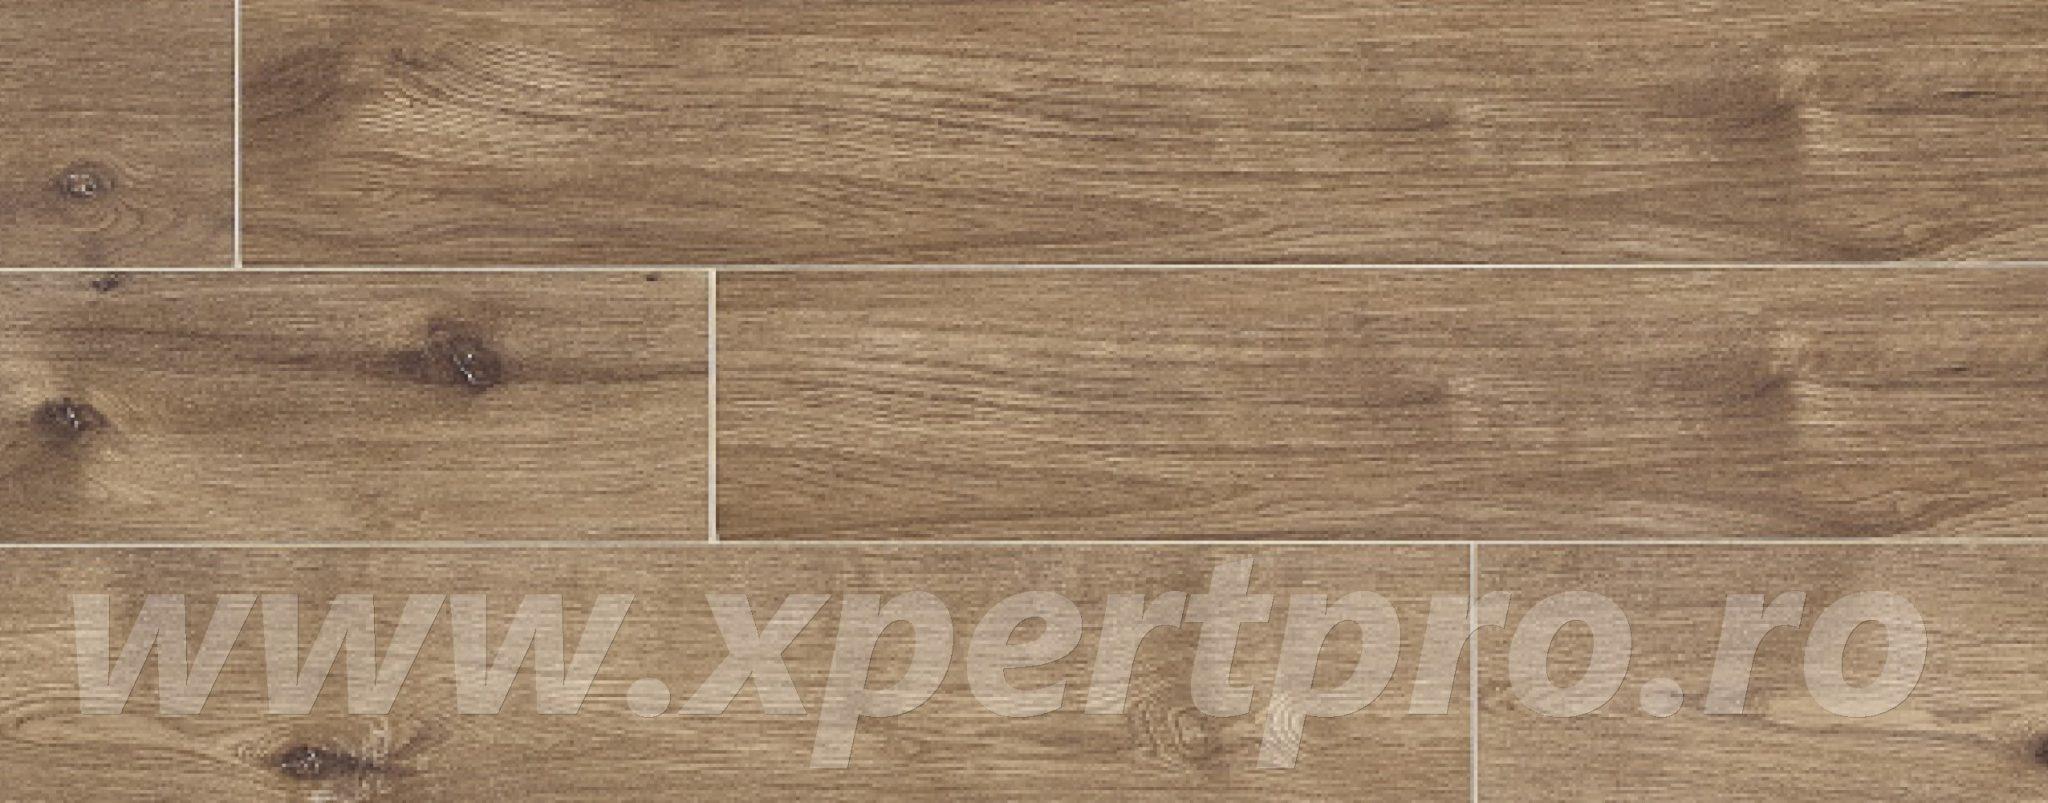 Parchet laminat Bucuresti Xpert Pro 970 Madagascar Oak